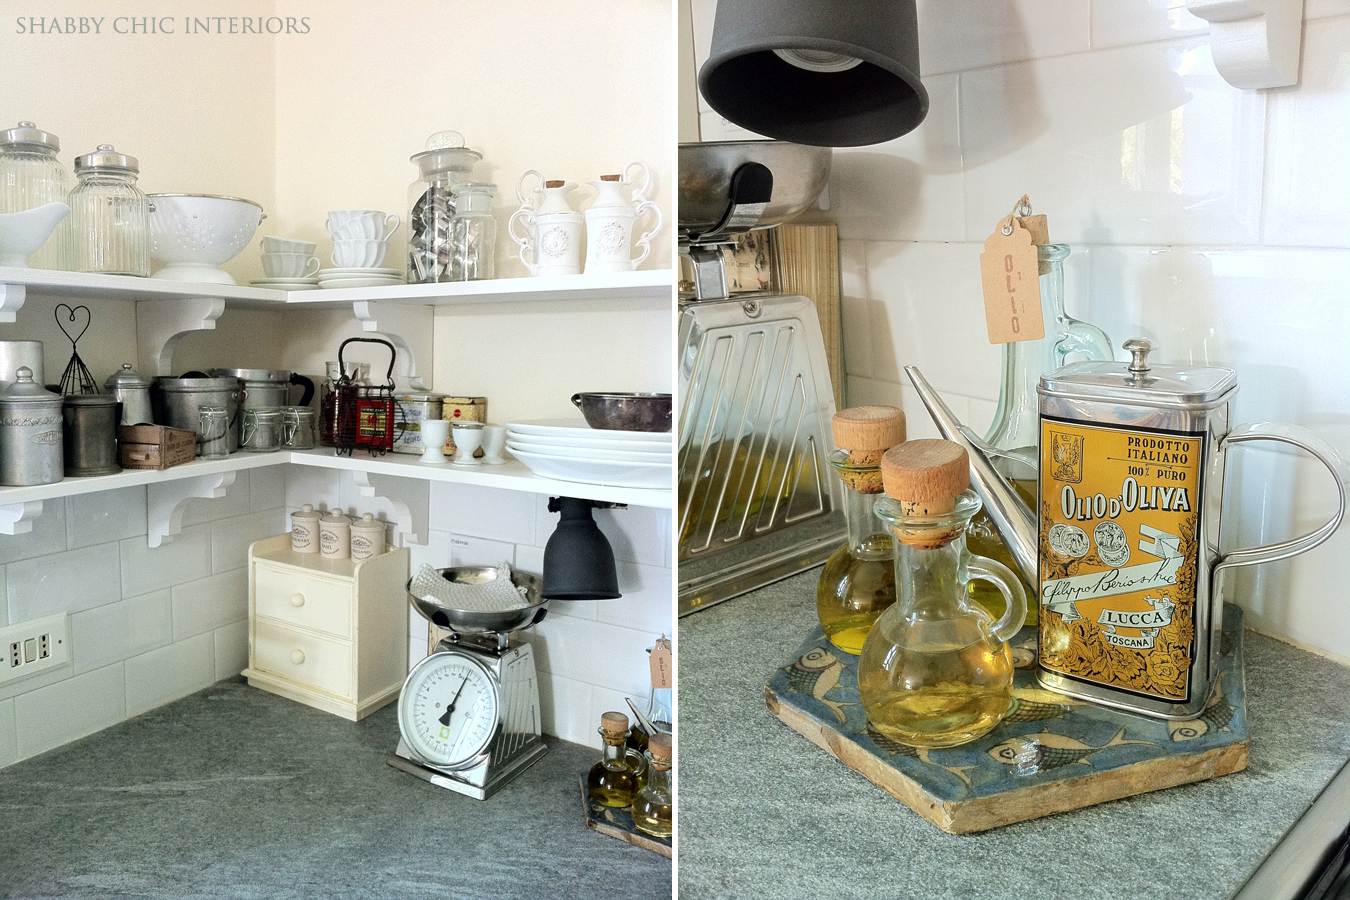 Dettagli in cucina shabby chic interiors for Shabby chic cucina